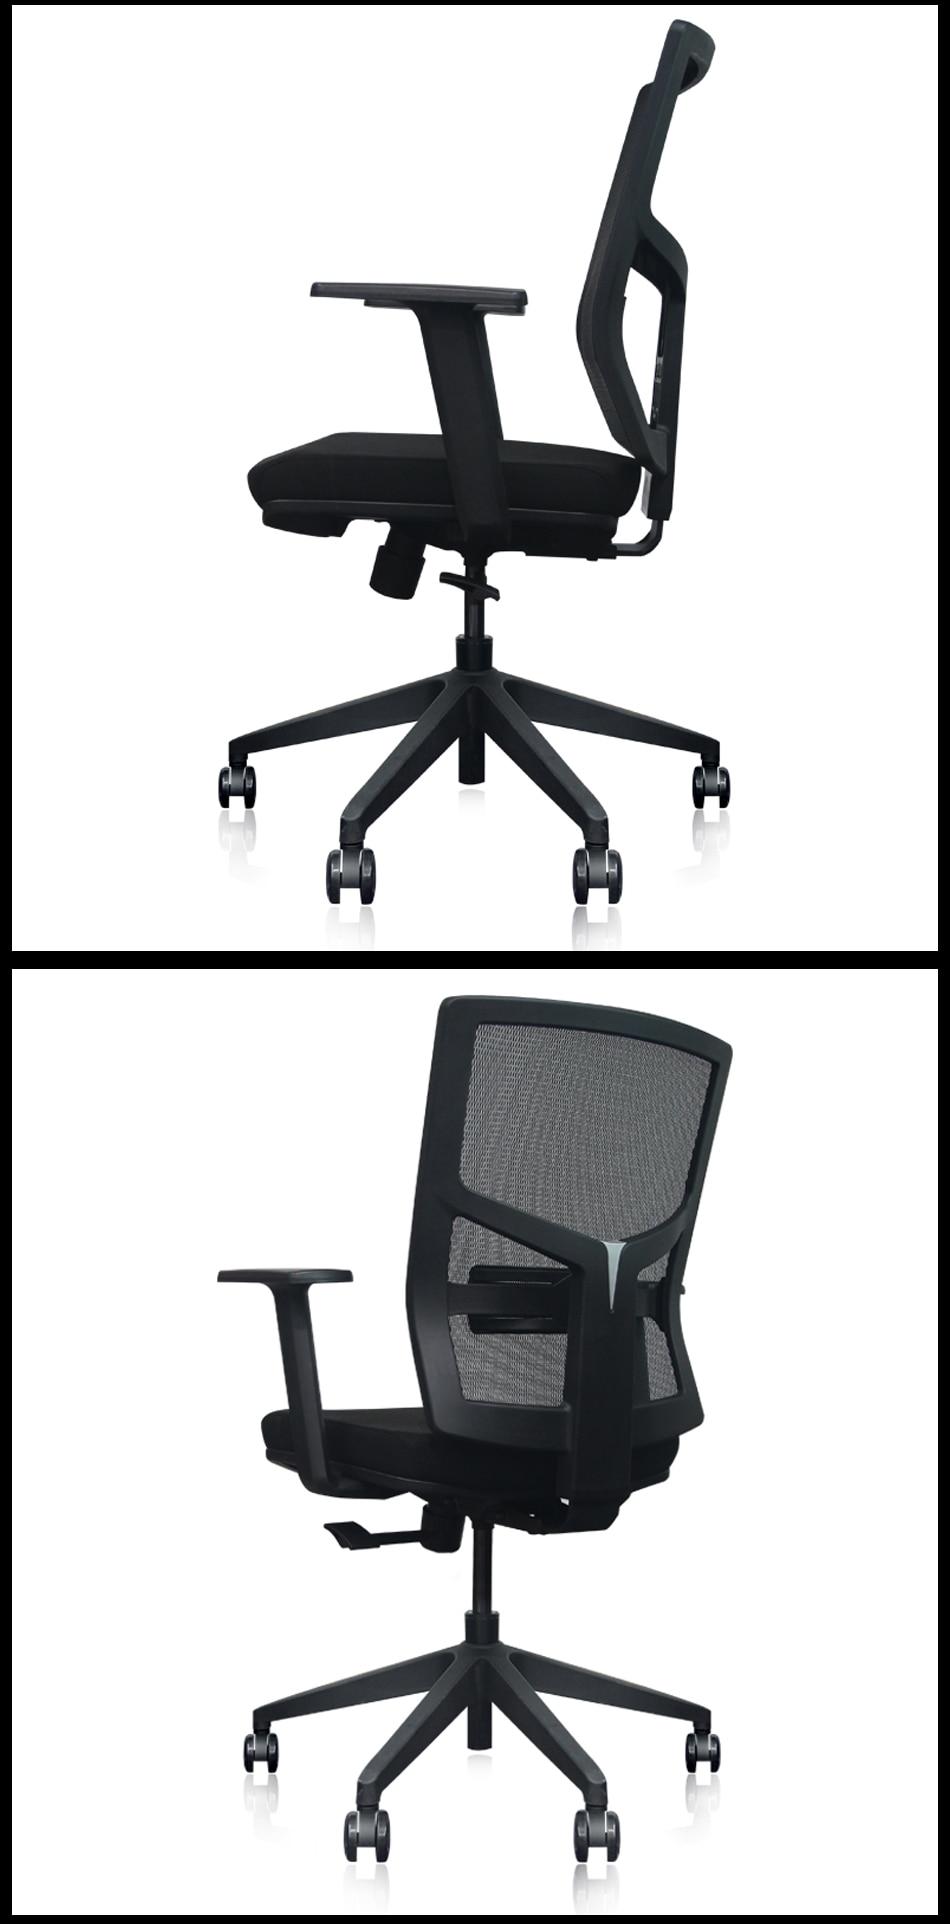 Chinese Free Chairs USA 13